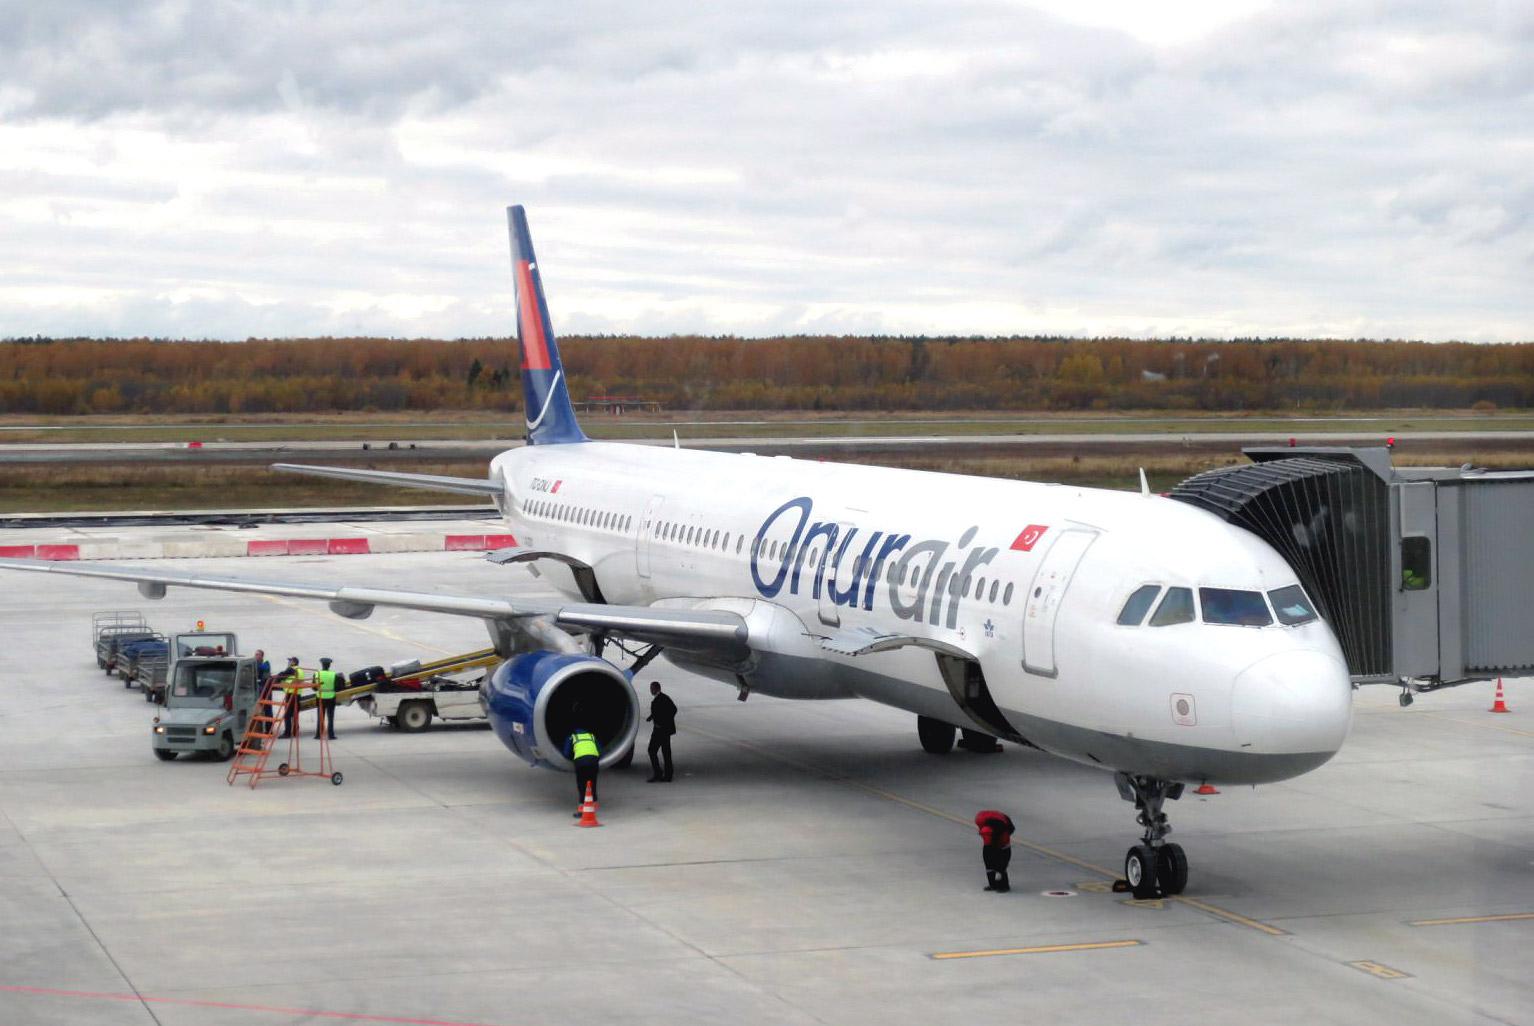 Фото Airbus A321 авиакомпании Onurair в аэропорту Нижний Новгород Стригино